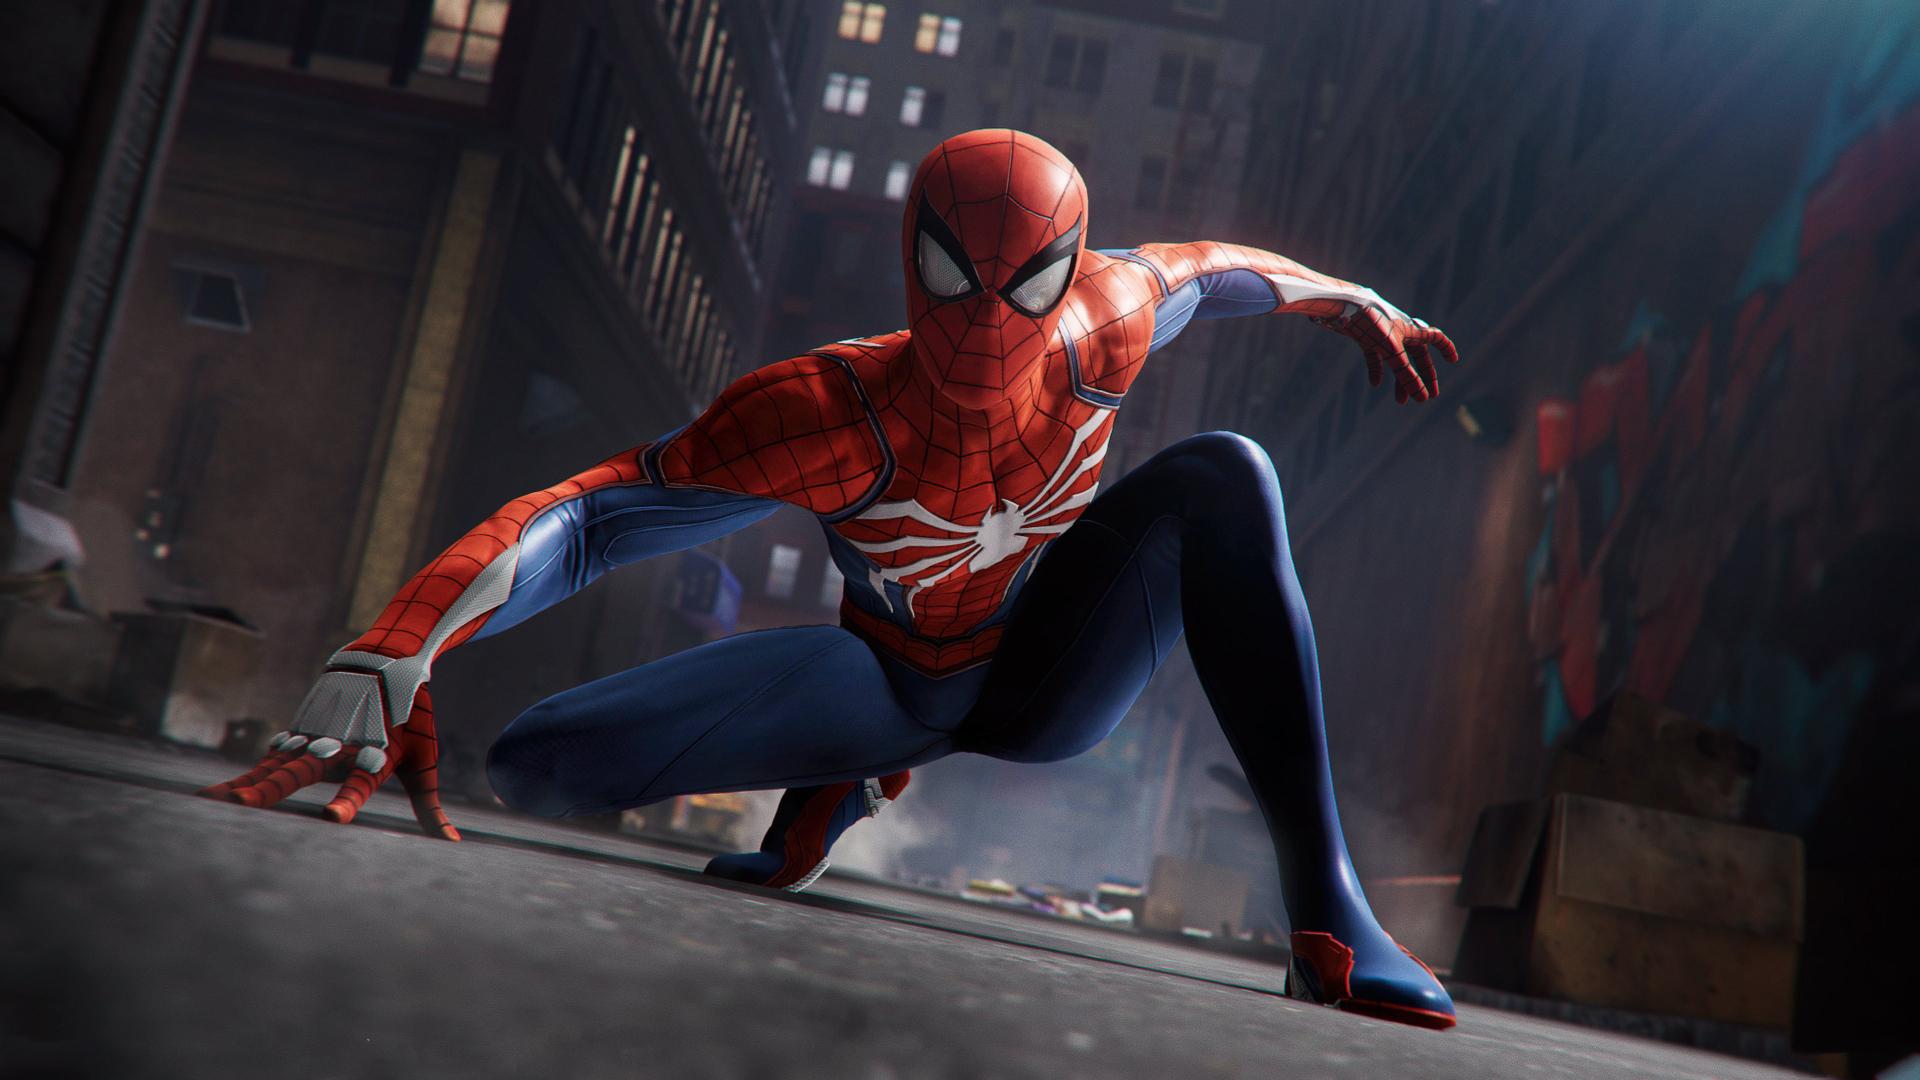 Game Of Spider Man Hd Wallpaper: Spider Man 2018 Game, HD 4K Wallpaper